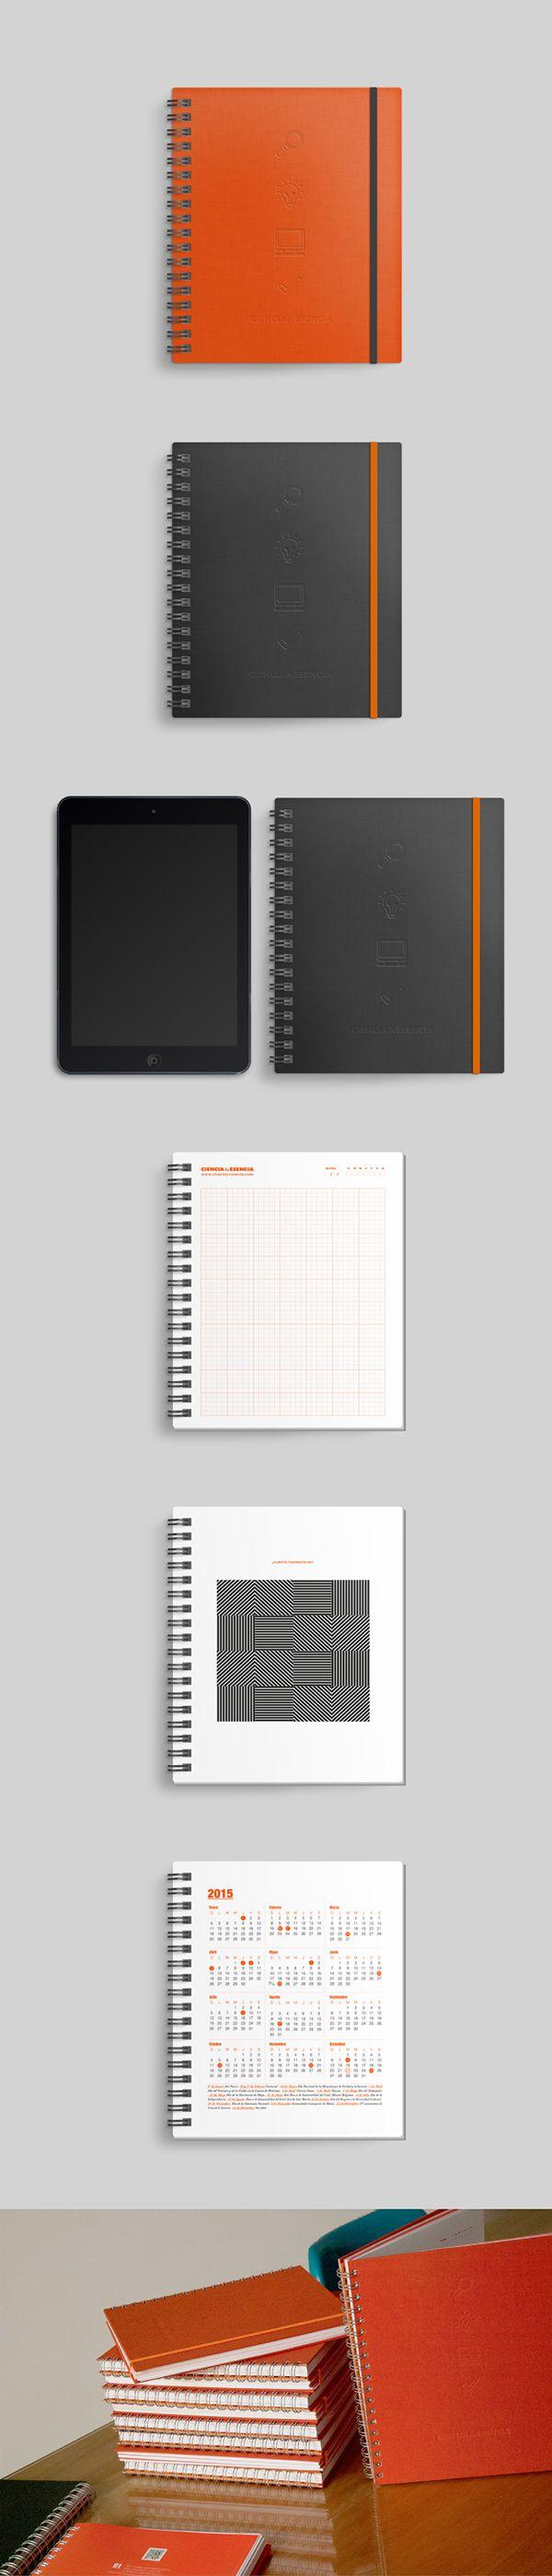 Cuaderno 2014   C&E